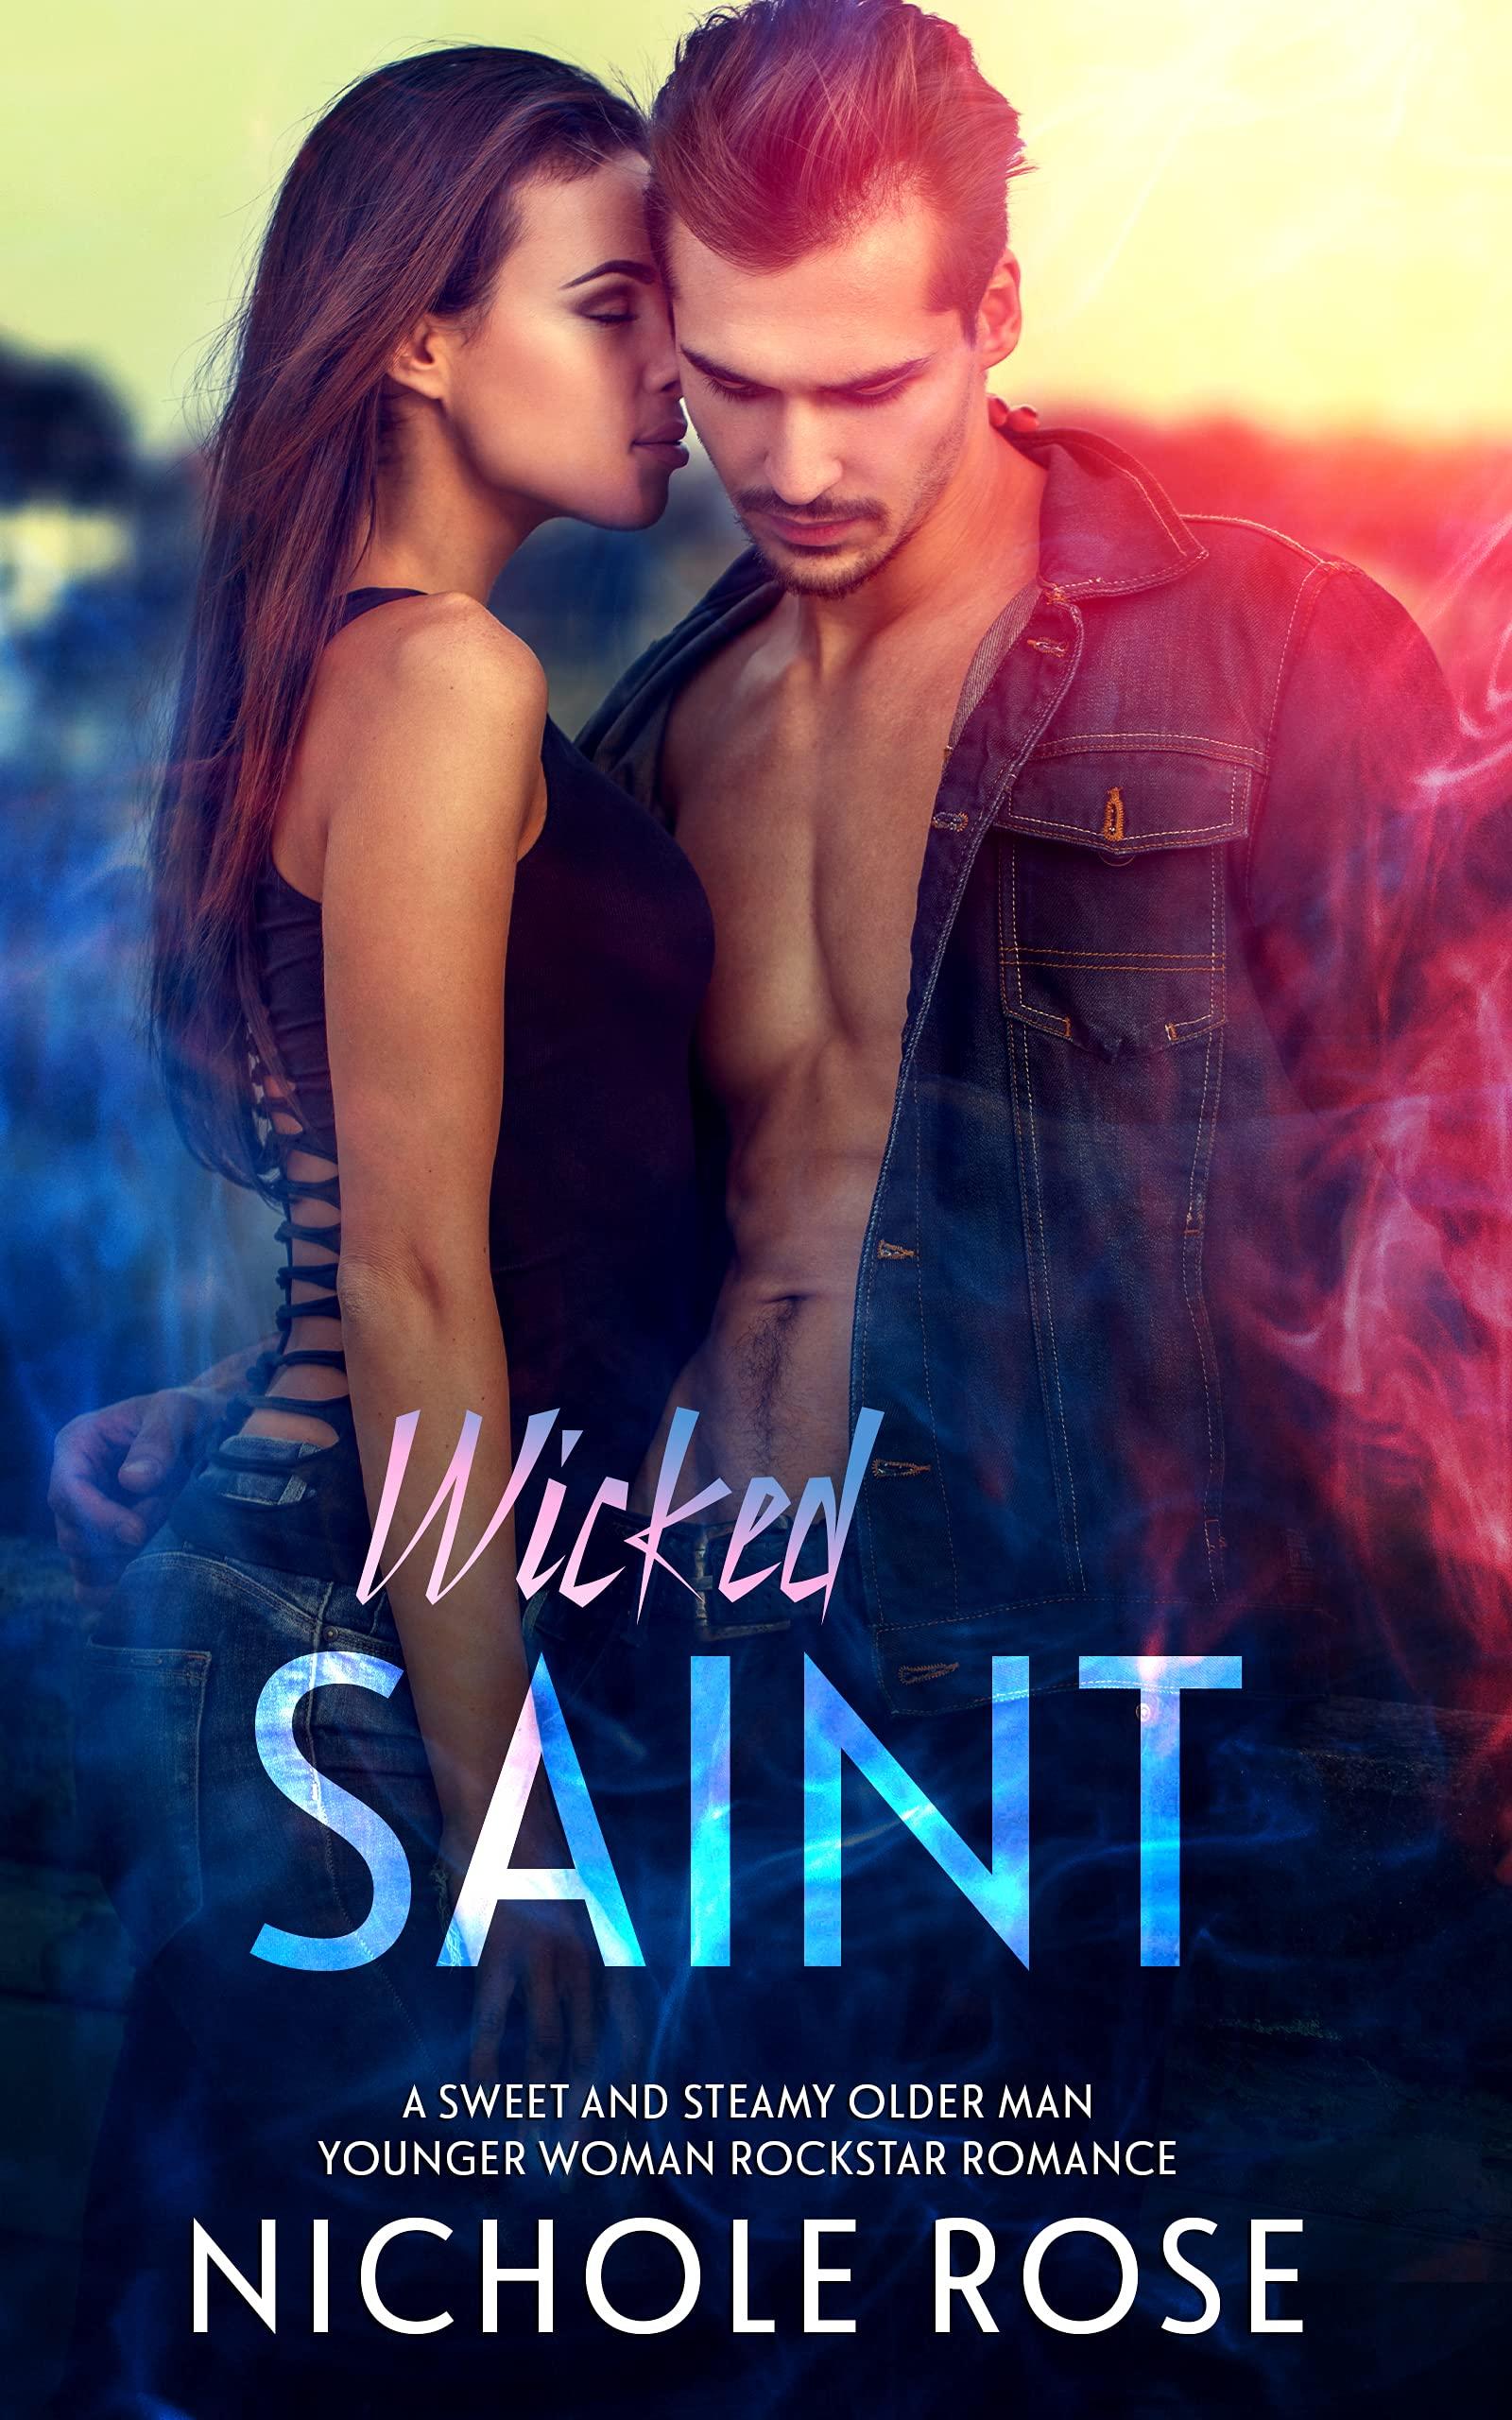 Wicked Saint: An Age-Gap Rockstar Romance